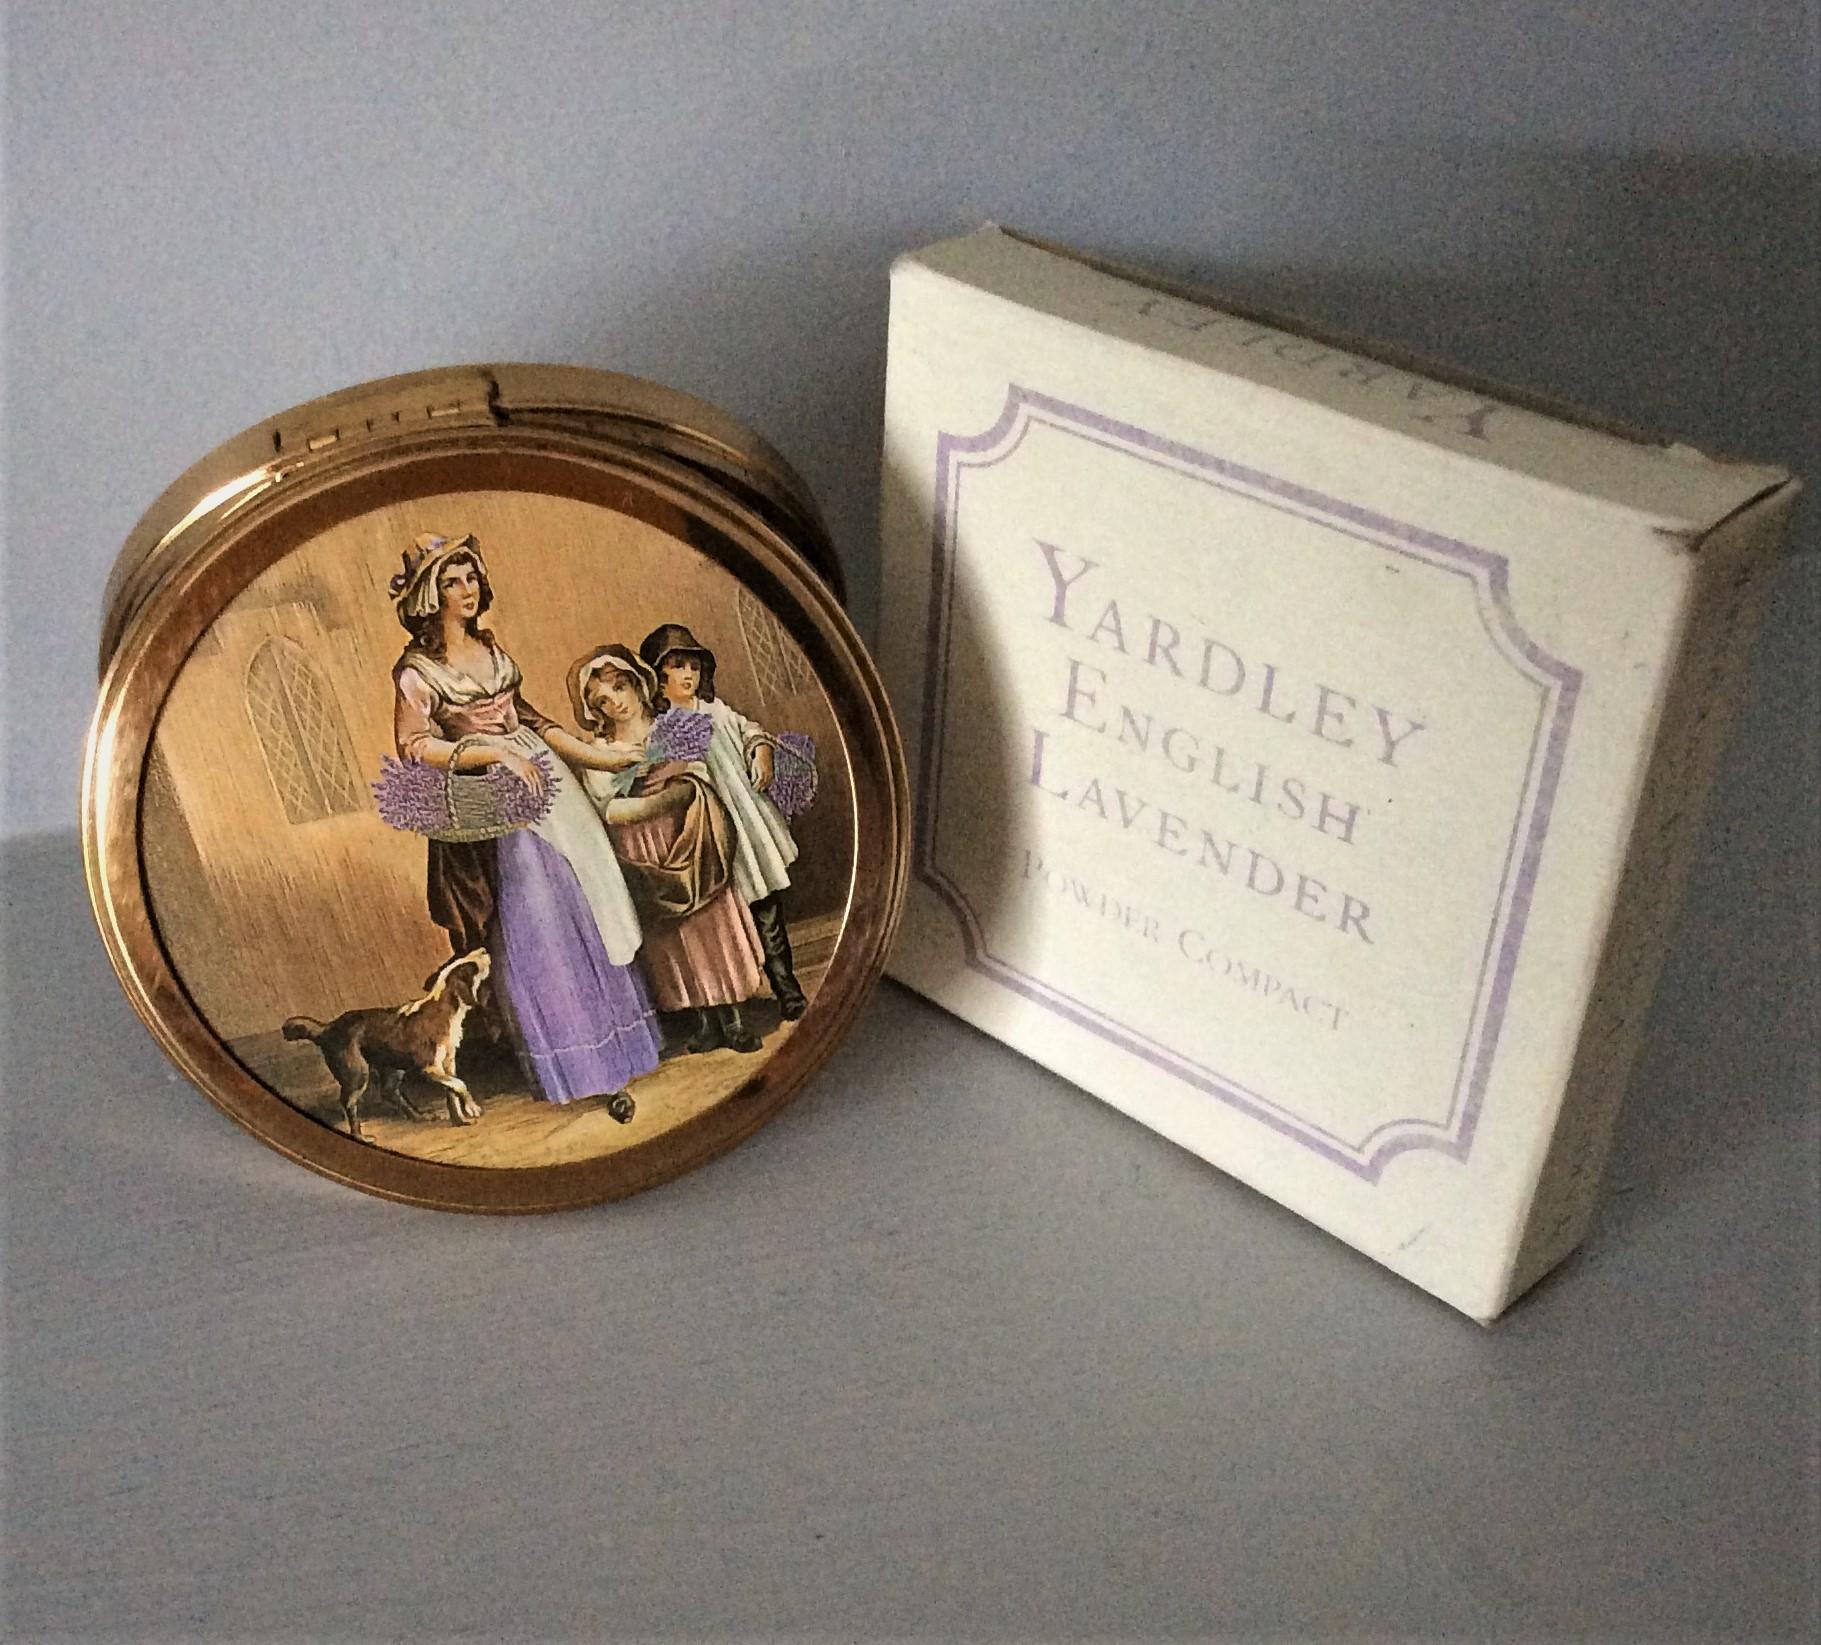 Vintage 60s YARDLEY English Lavender Powder Compact with original box